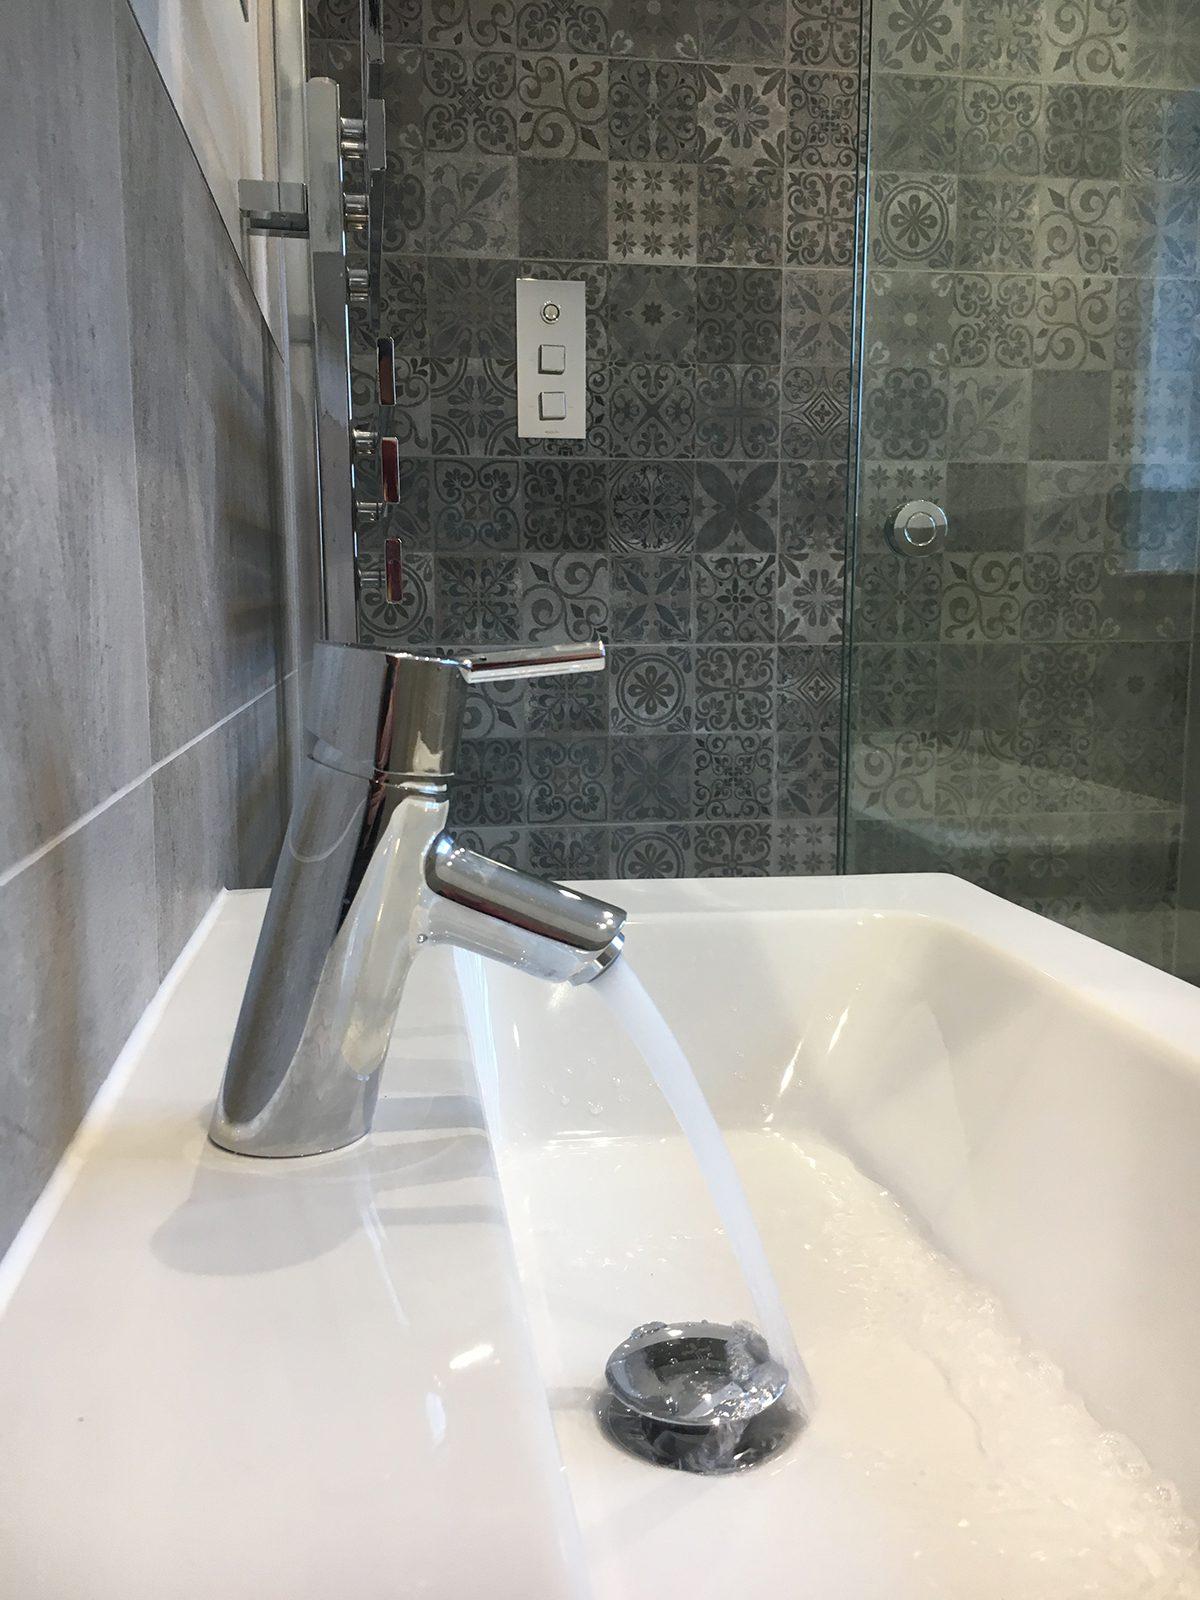 The Cambridge Bath Co bathroom sink tap